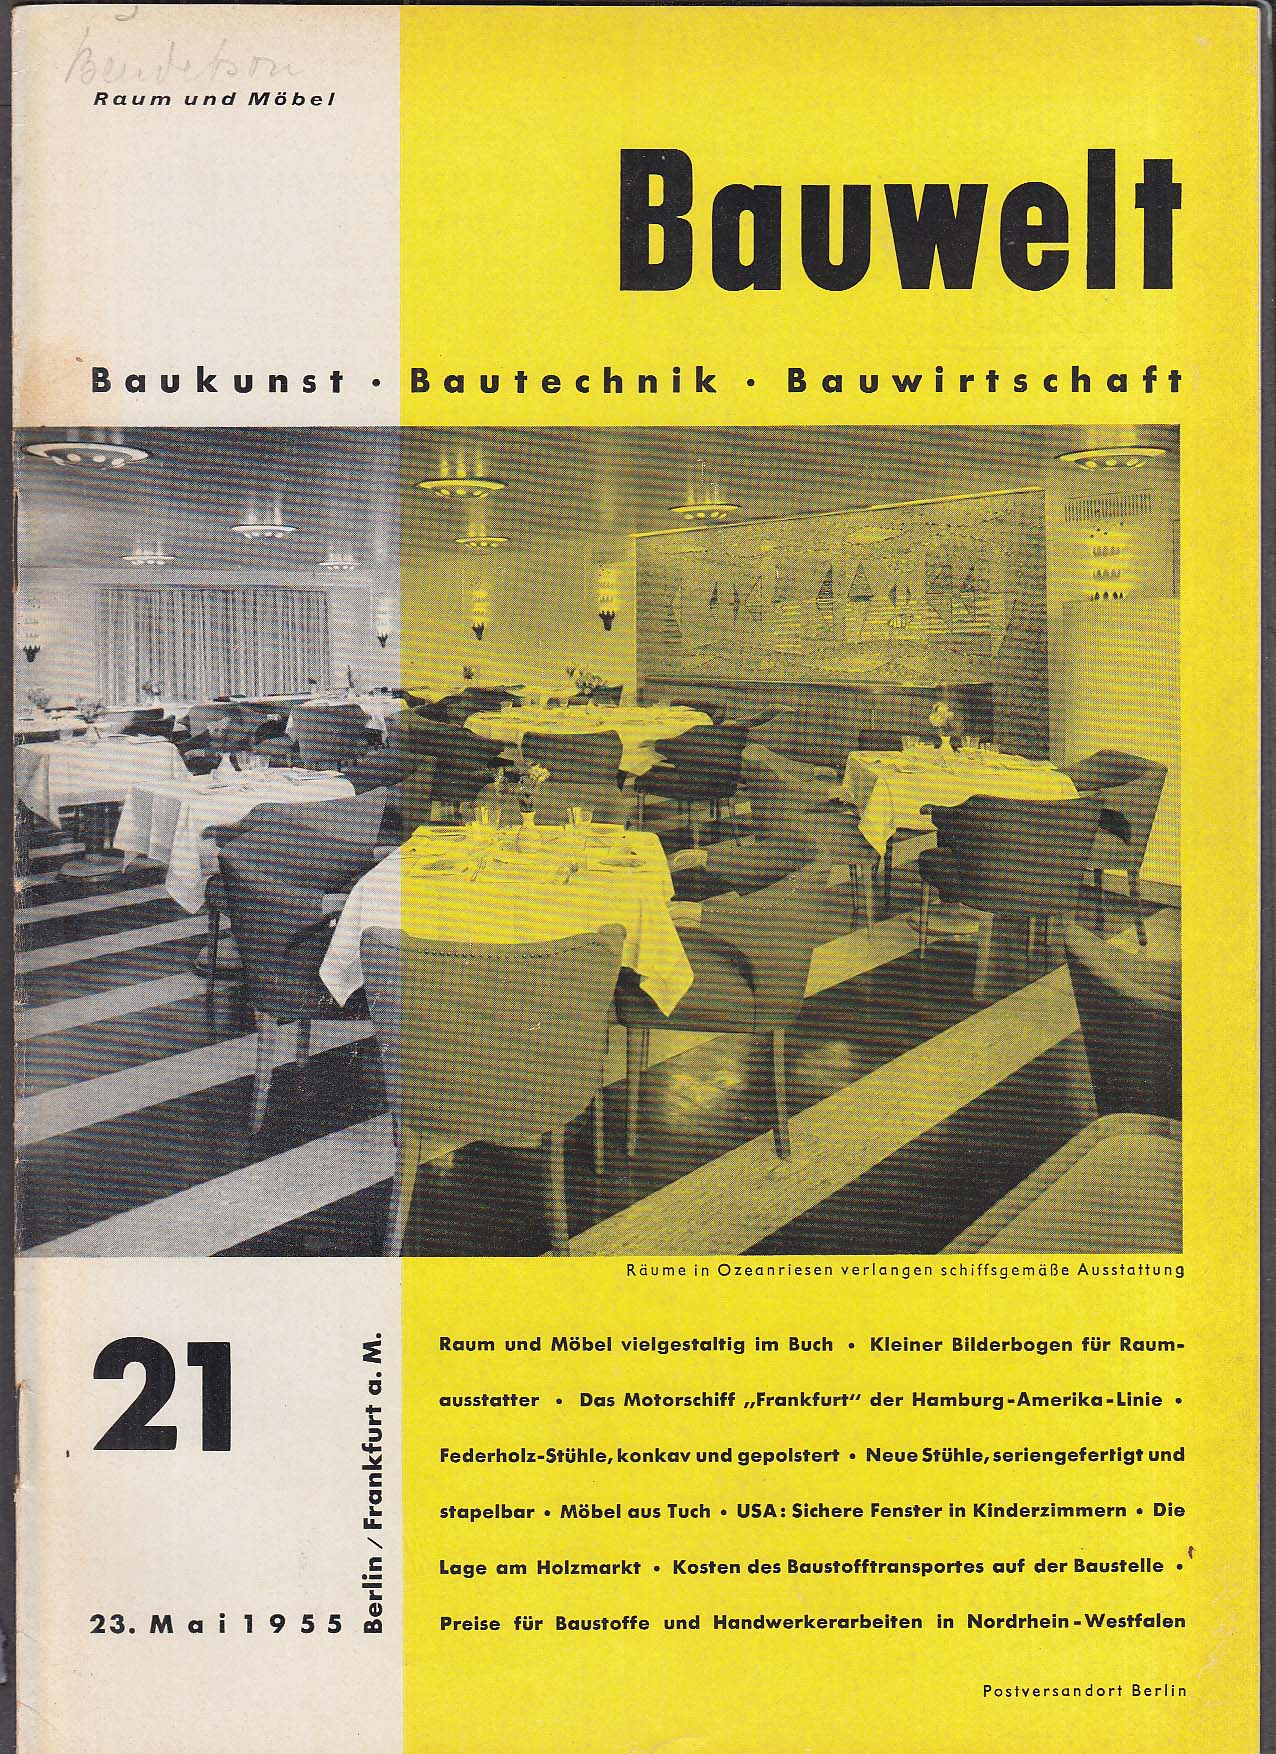 Bauwelt German architecture magazine 5/23/1955 21